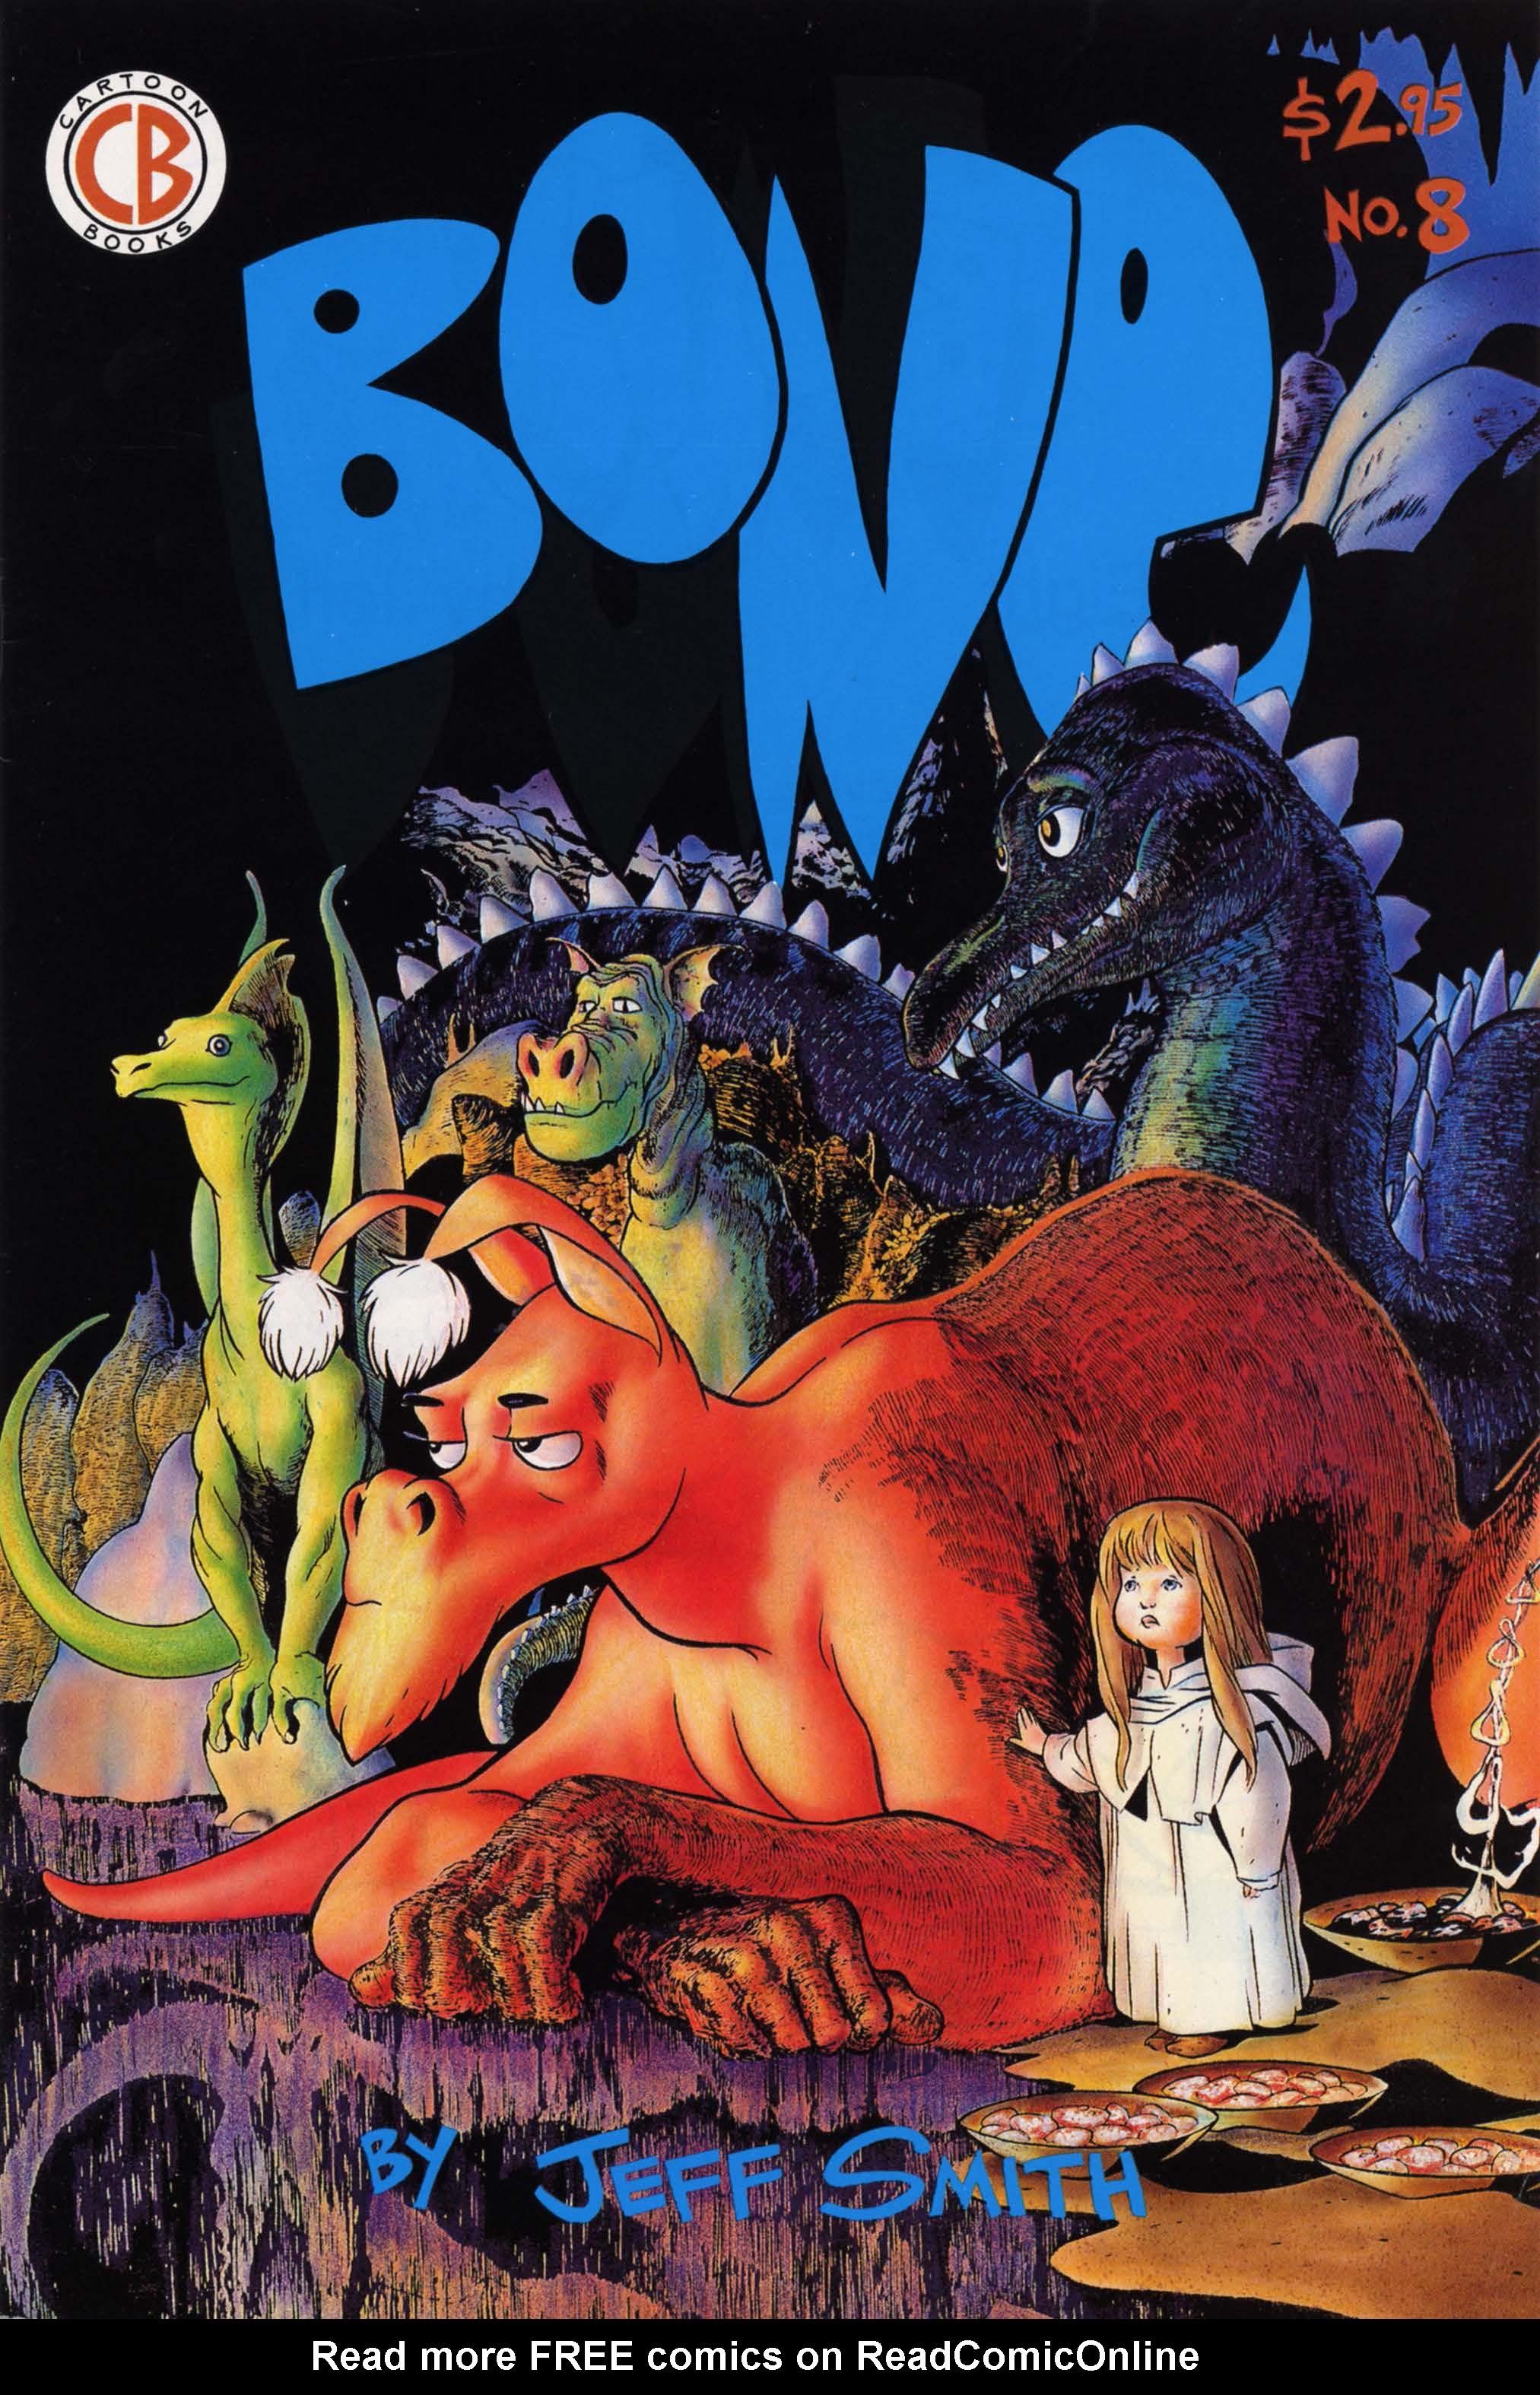 Bone 1991 Issue 8